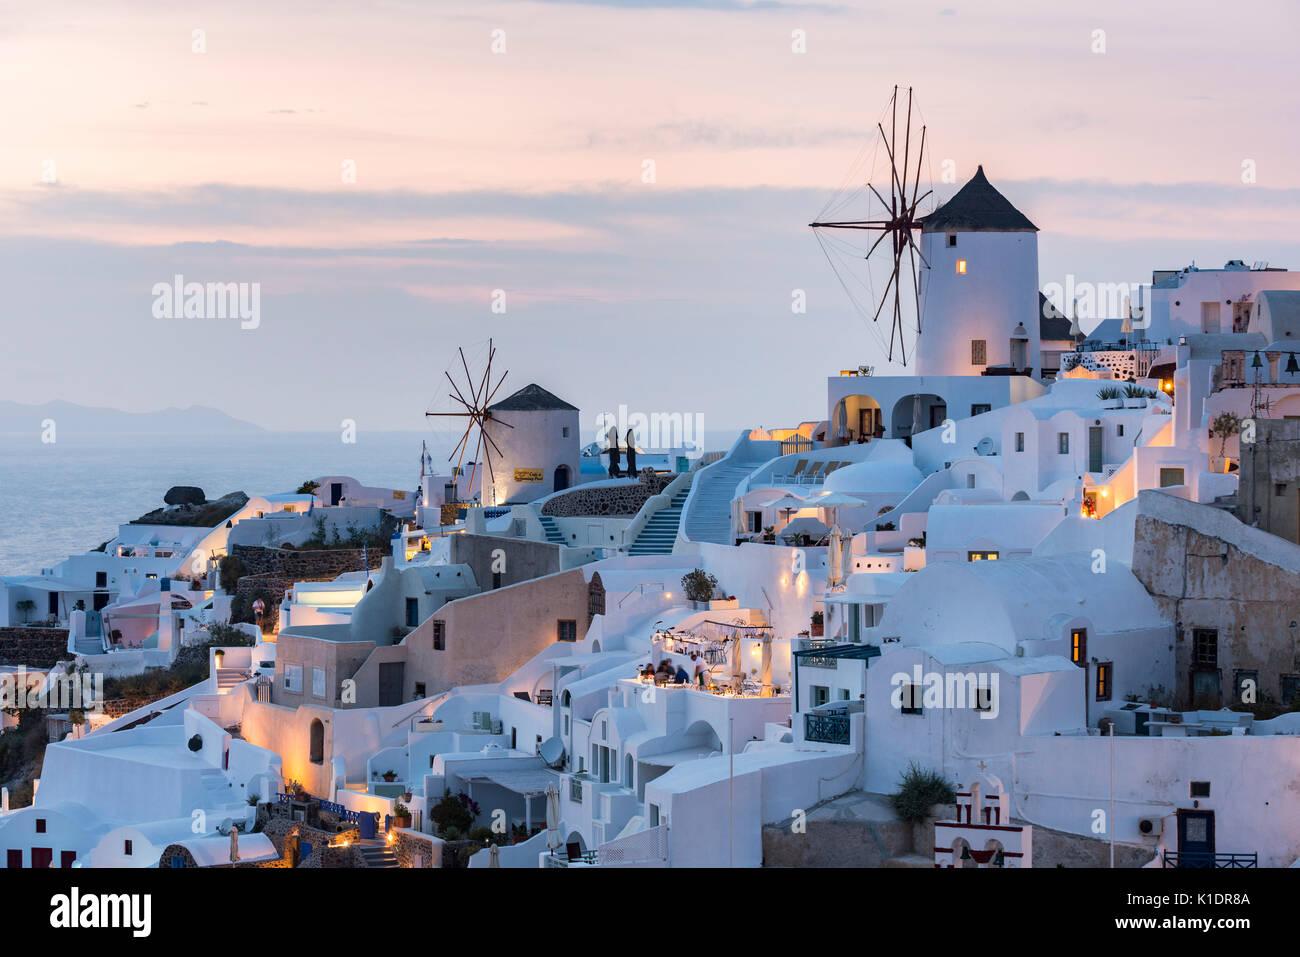 Stadtbild mit Windmühlen, Dämmerung, Oia, Santorini, Kykladen, Griechenland Stockbild